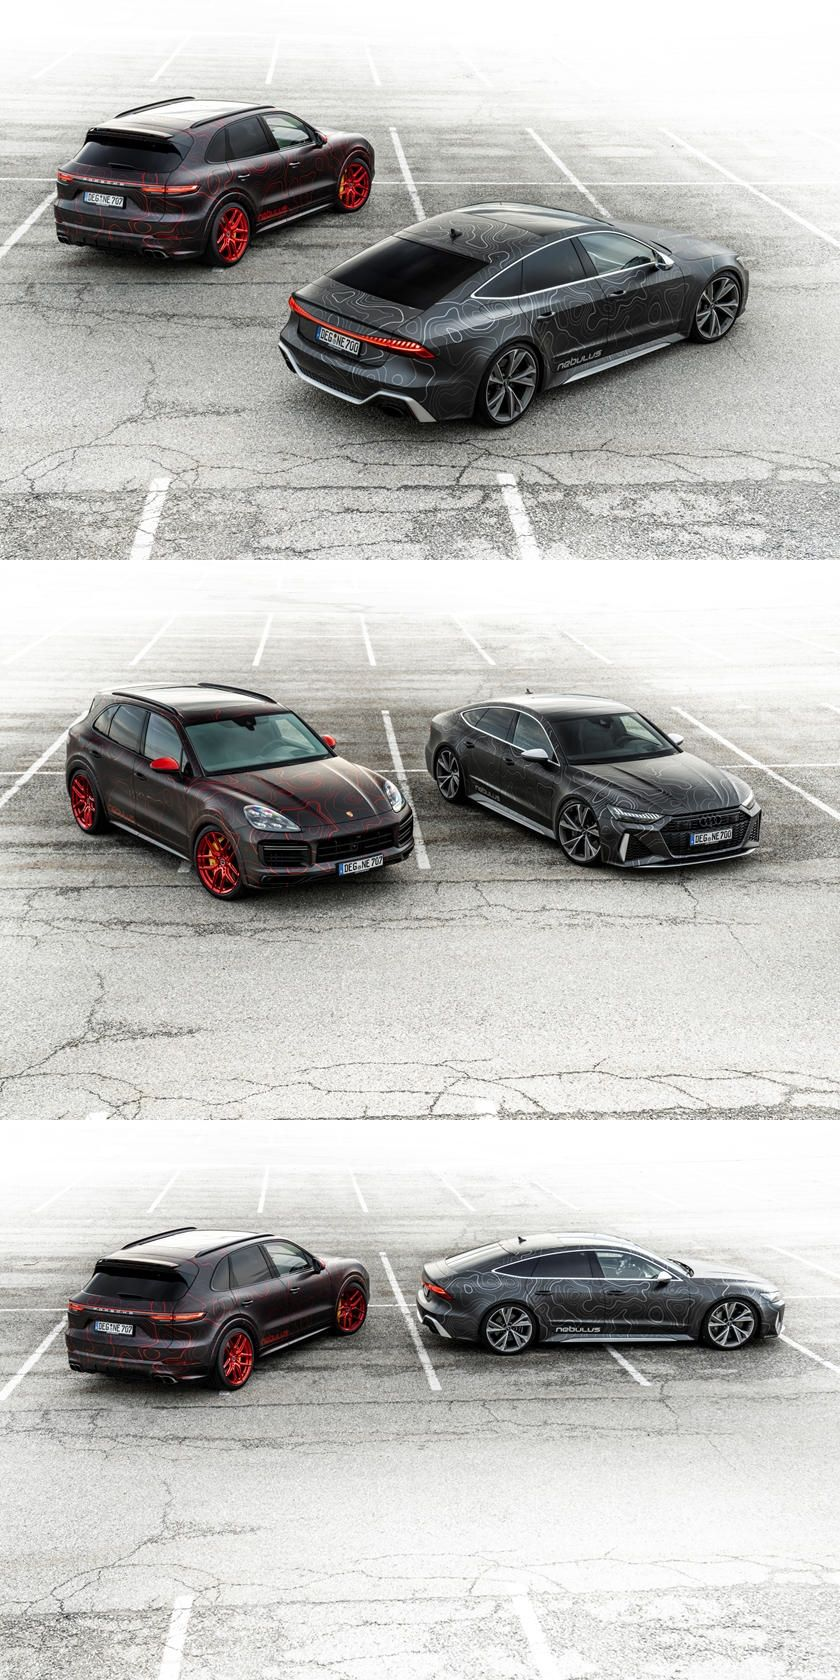 Porsche Cayenne Gets Extreme Makeover And 1000 HP. Dubbed the Nebulus Porsche's luxury SUV gets a wild transformation.